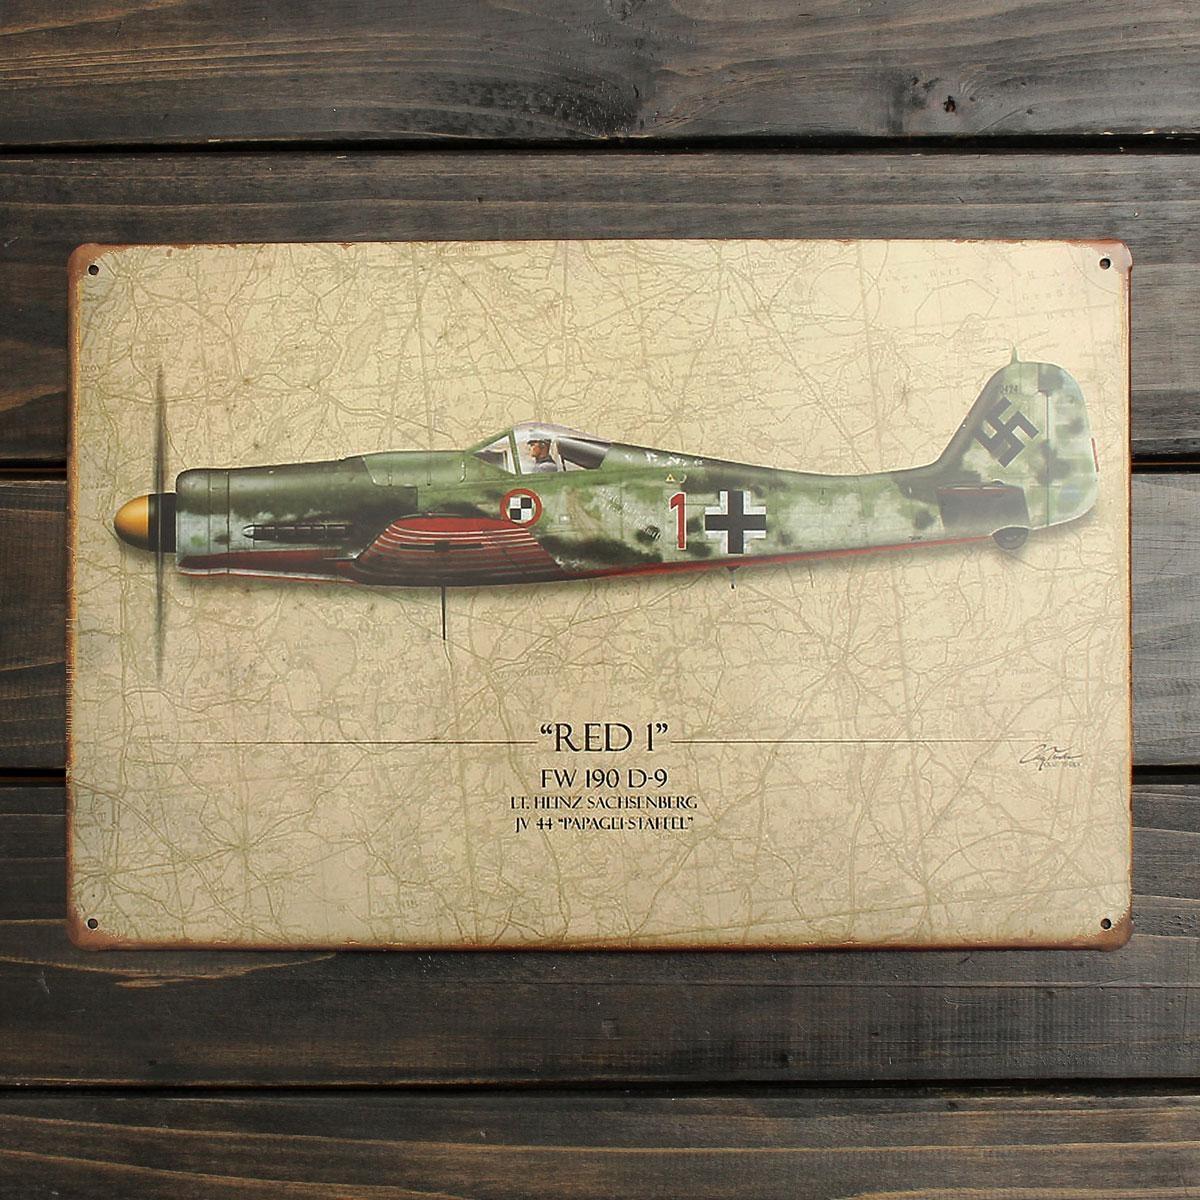 20X30Cm World War Vintage Military Battle Plane Sheet Metal In Sheet Metal Wall Art (View 20 of 20)